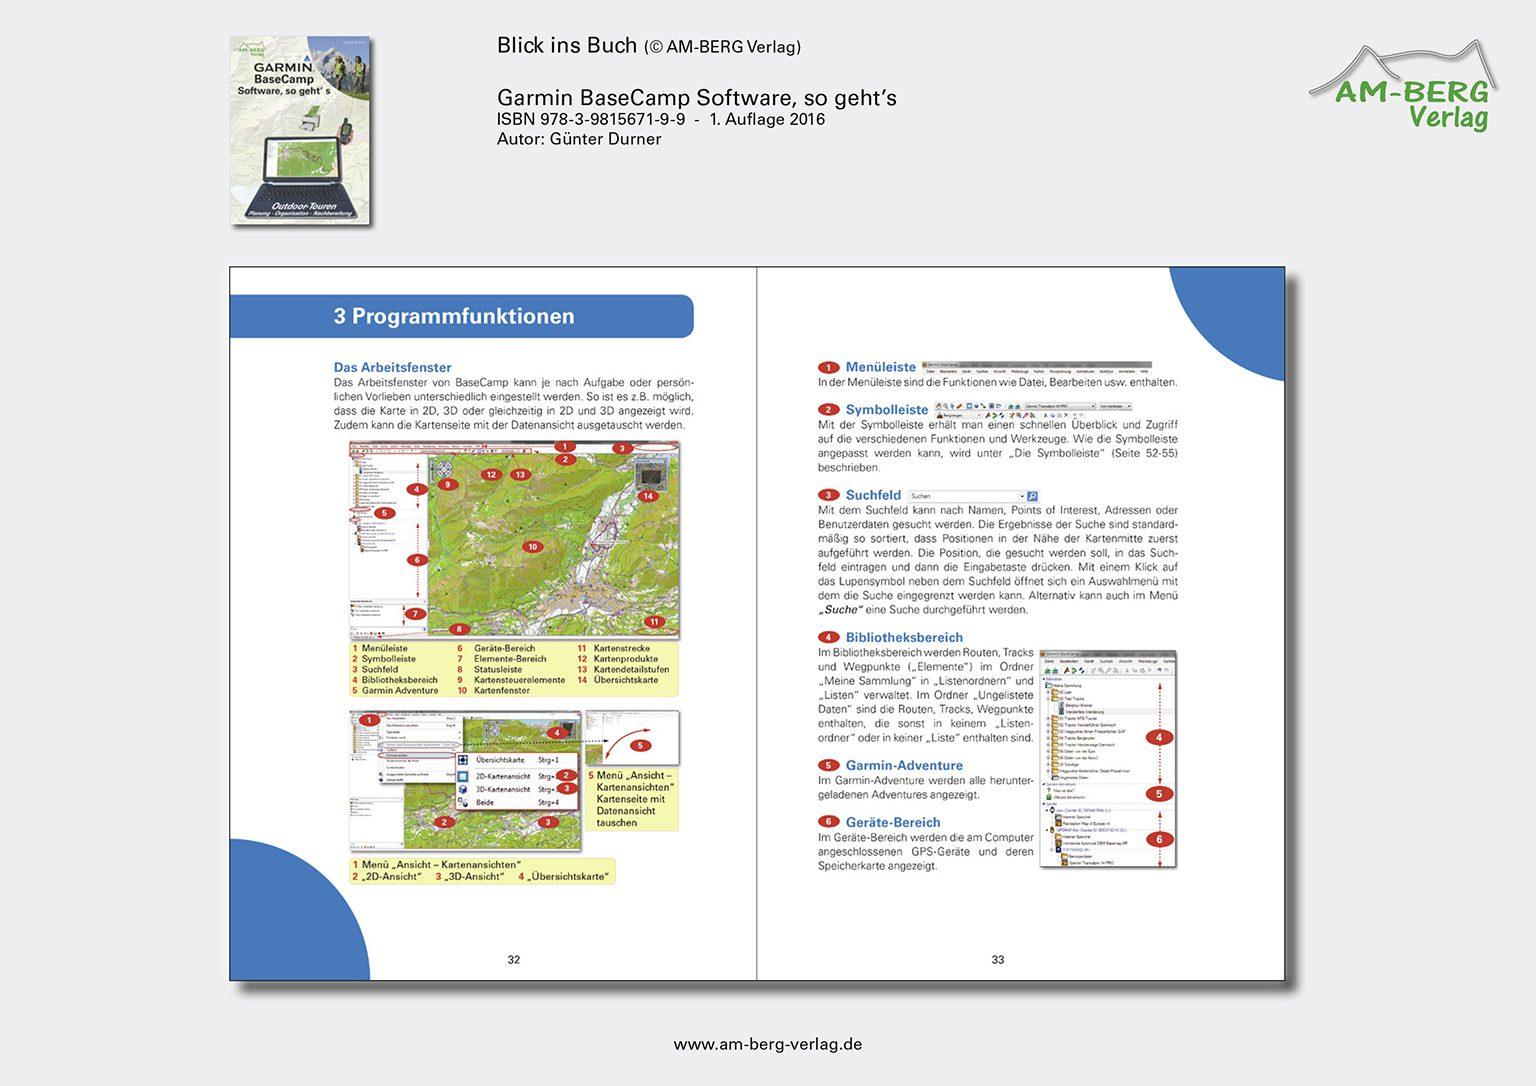 Garmin BaseCamp Software_BlickinsBuch5